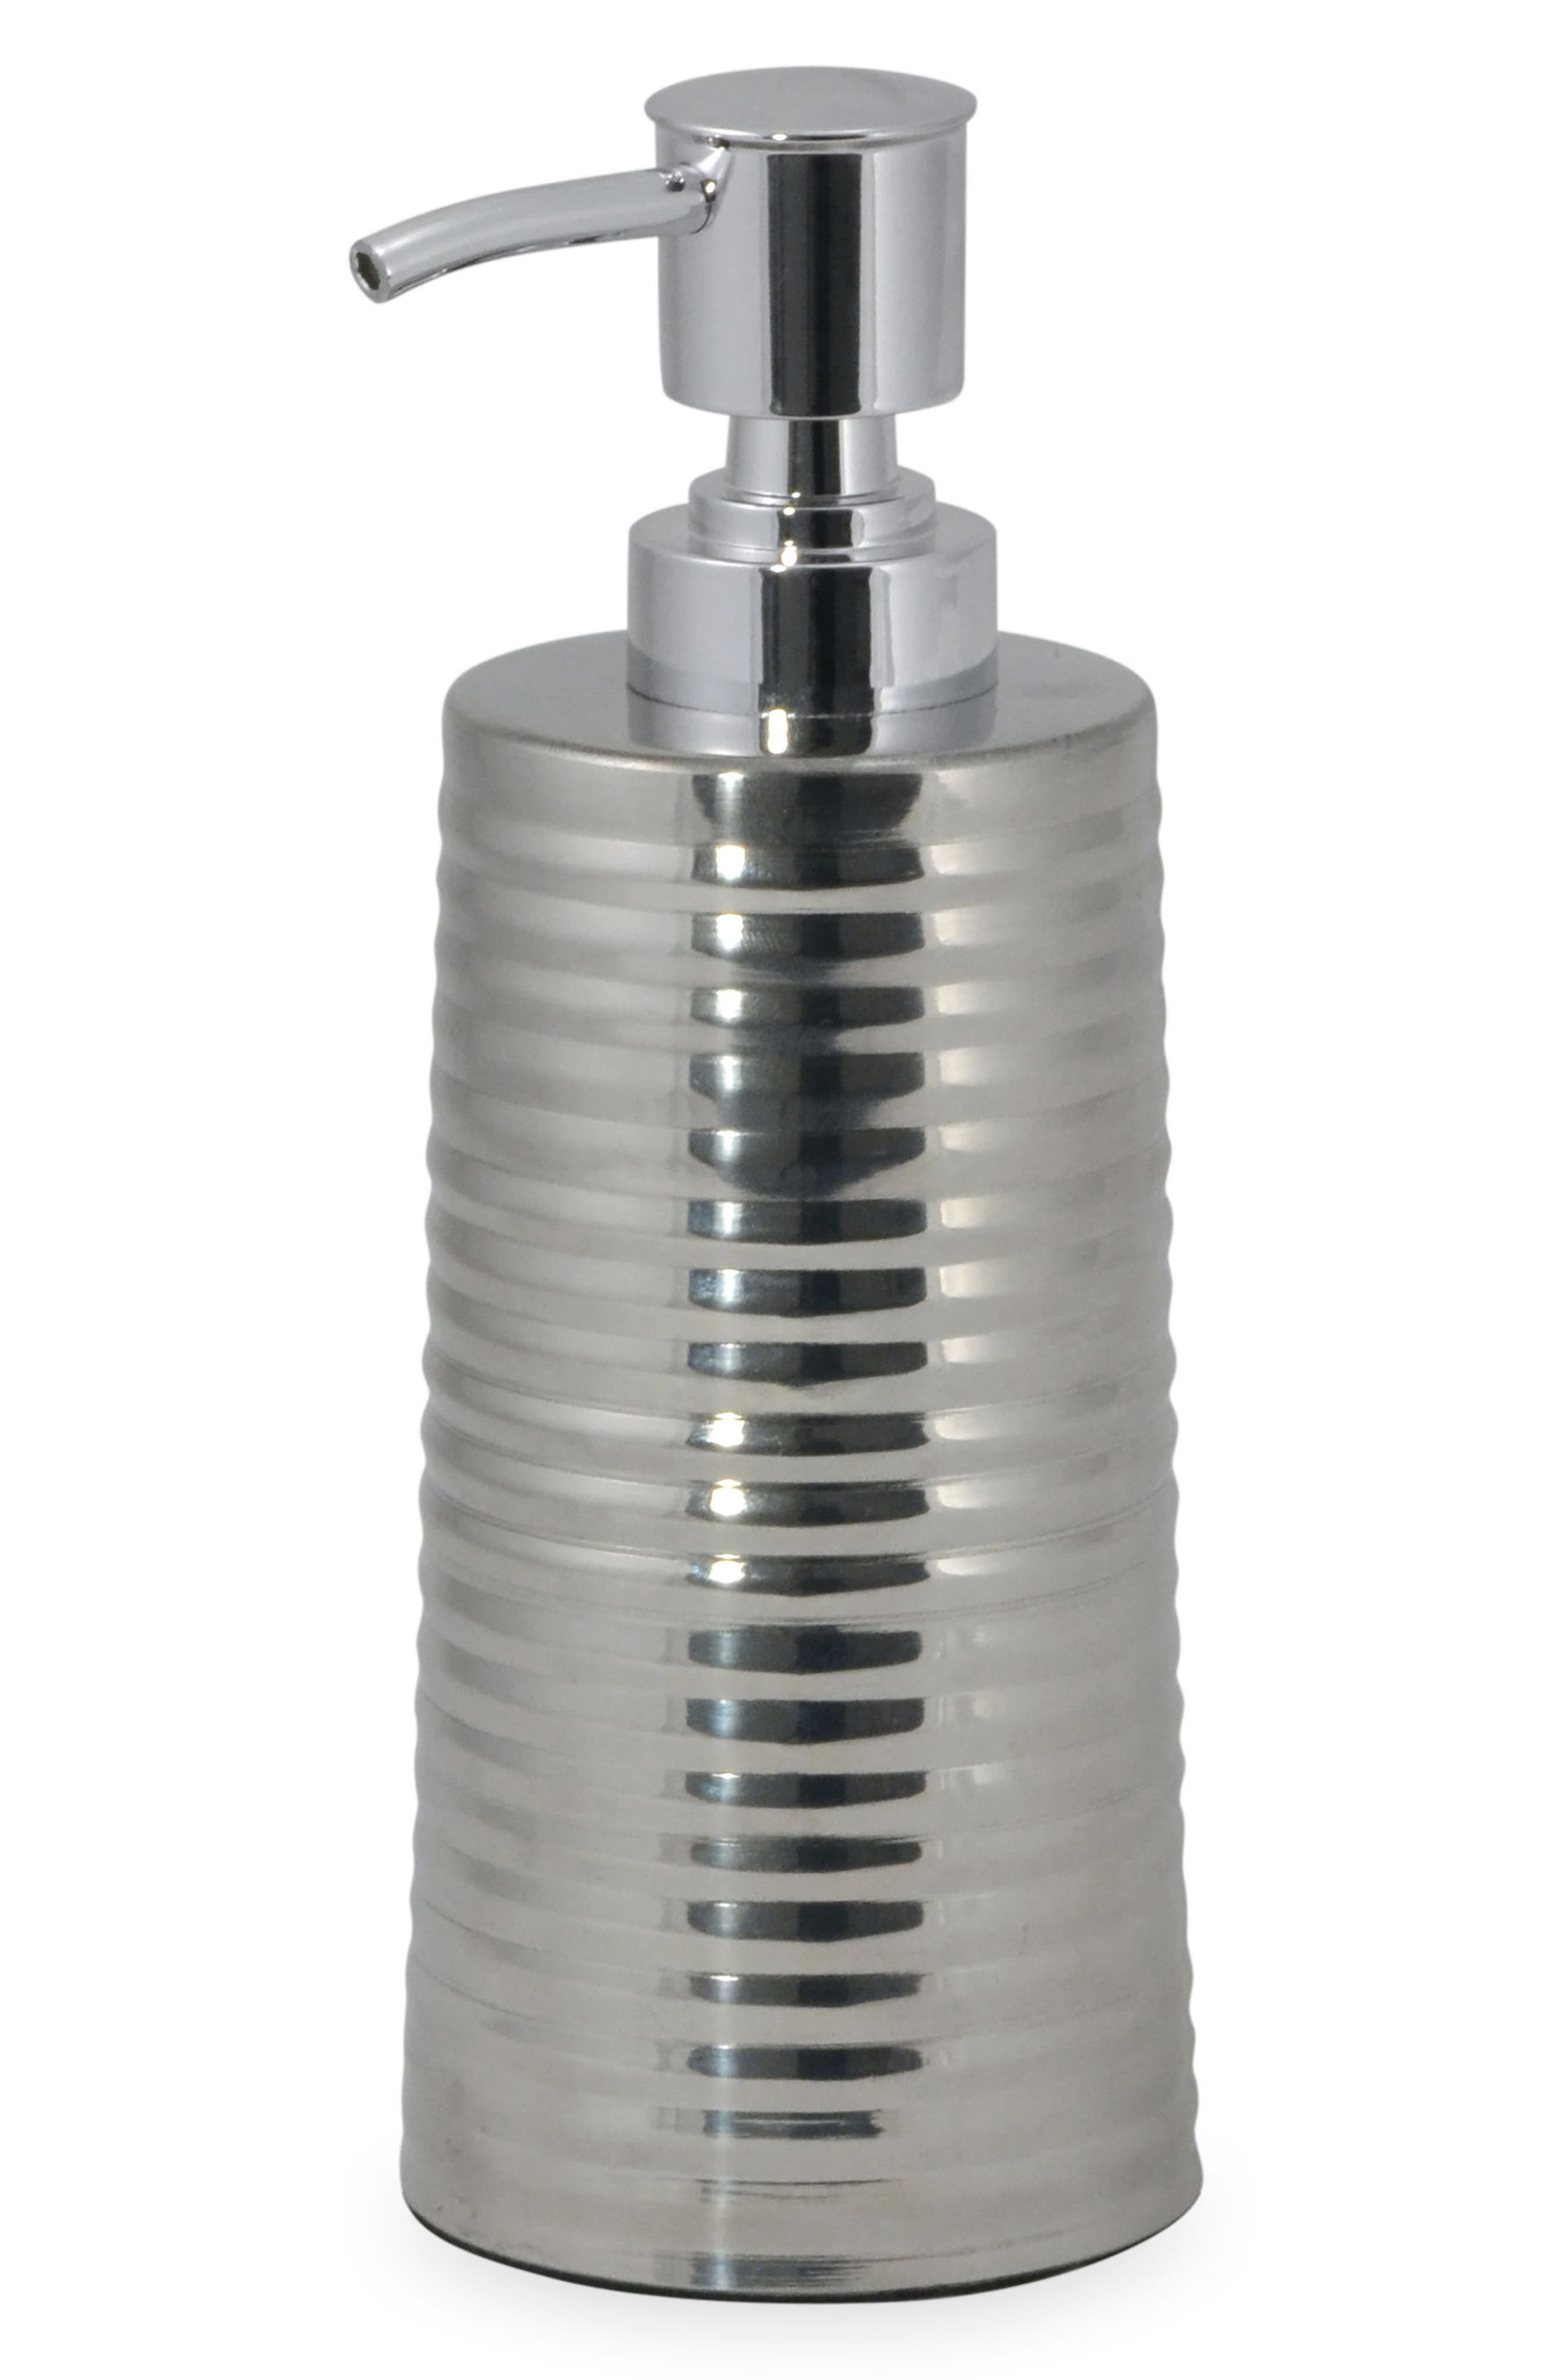 DKNY Corrugated Lotion Pump